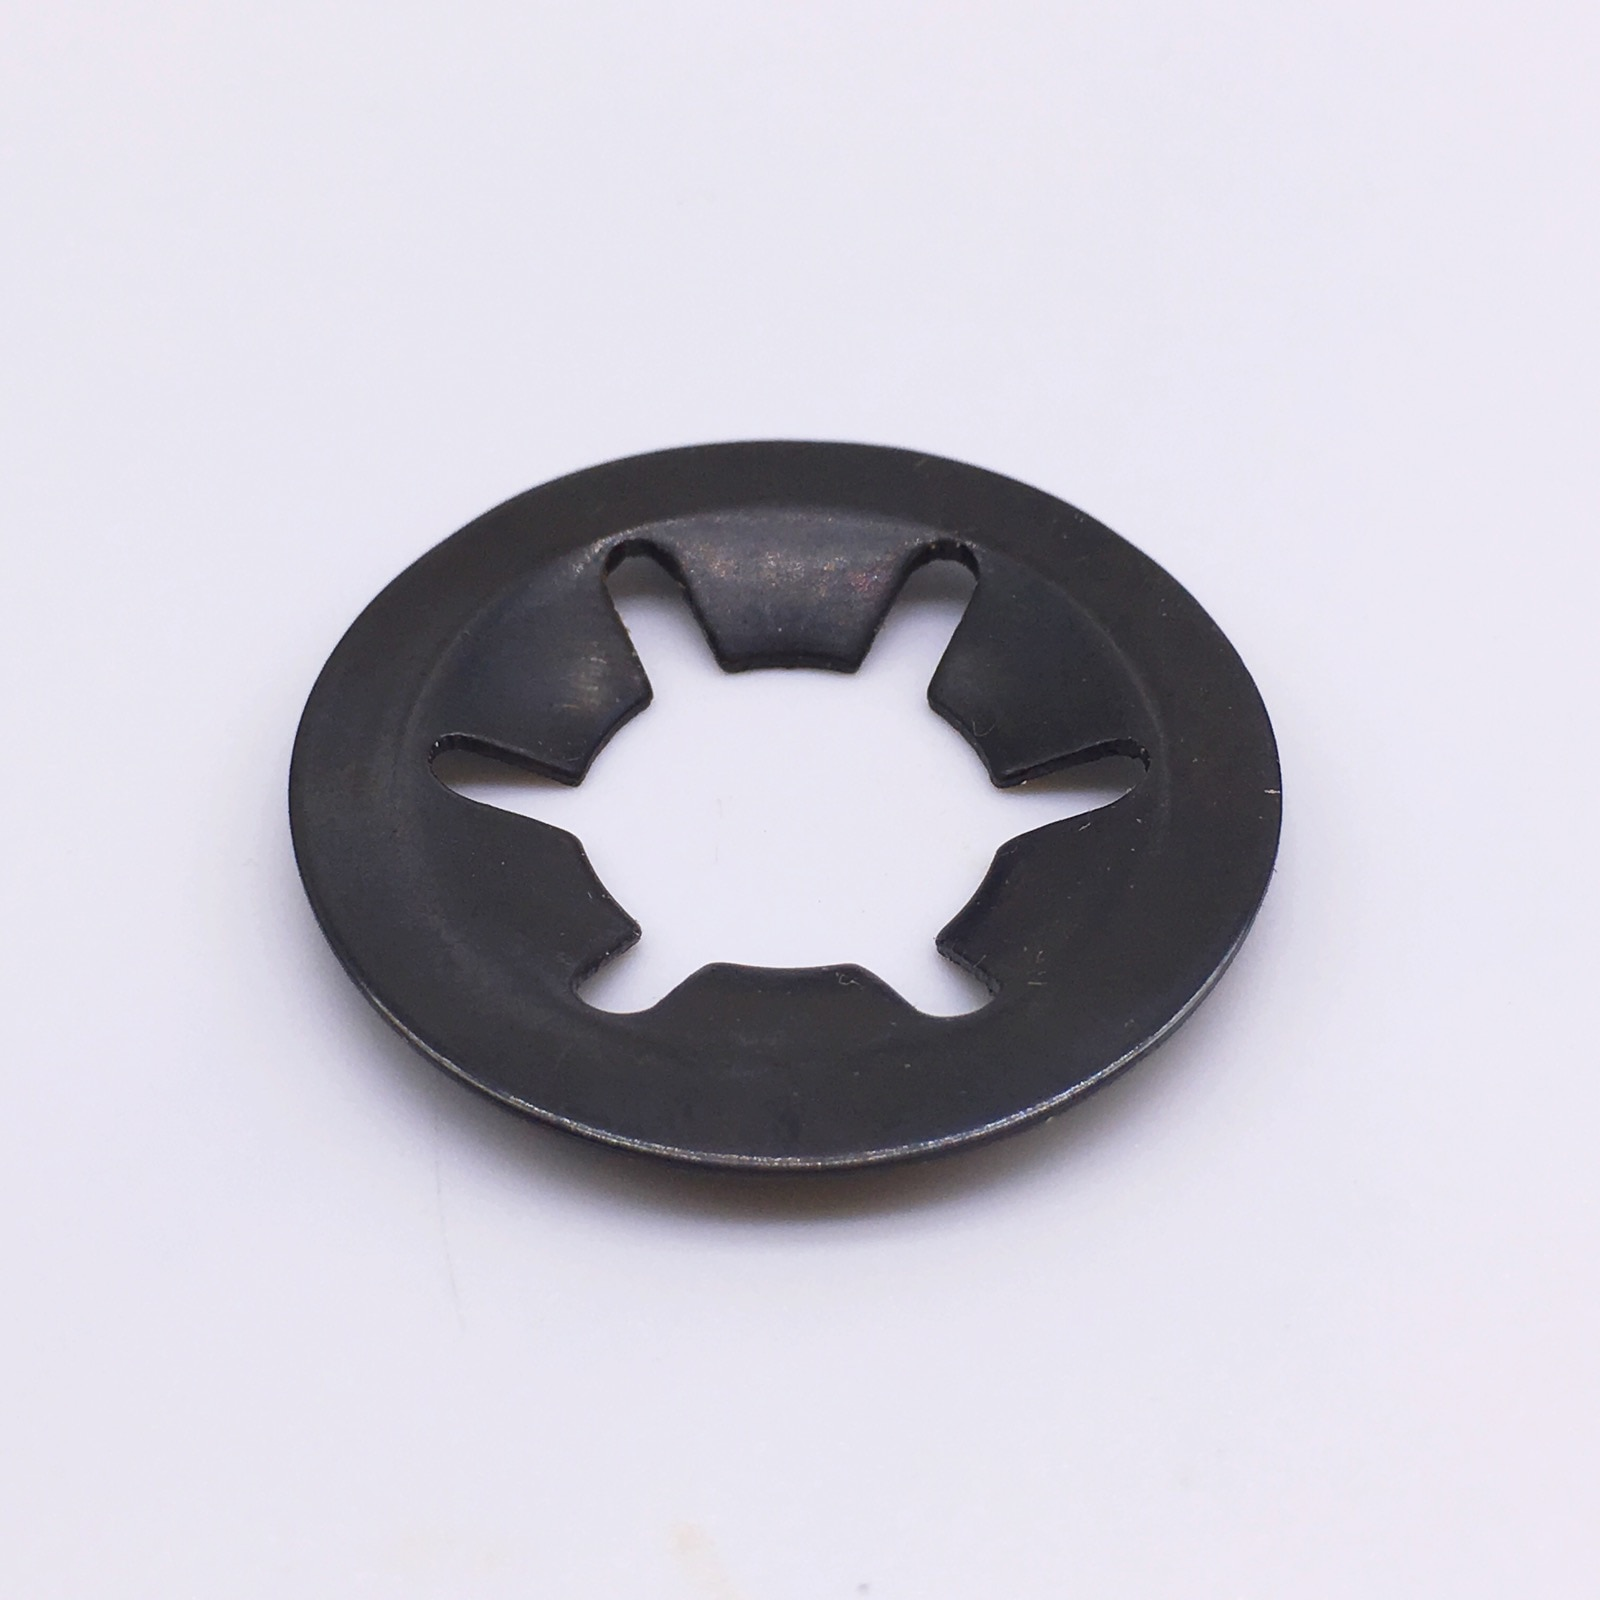 Wkooa-مثبتات غسيل Starlock ، M8 65Mn ، أسود